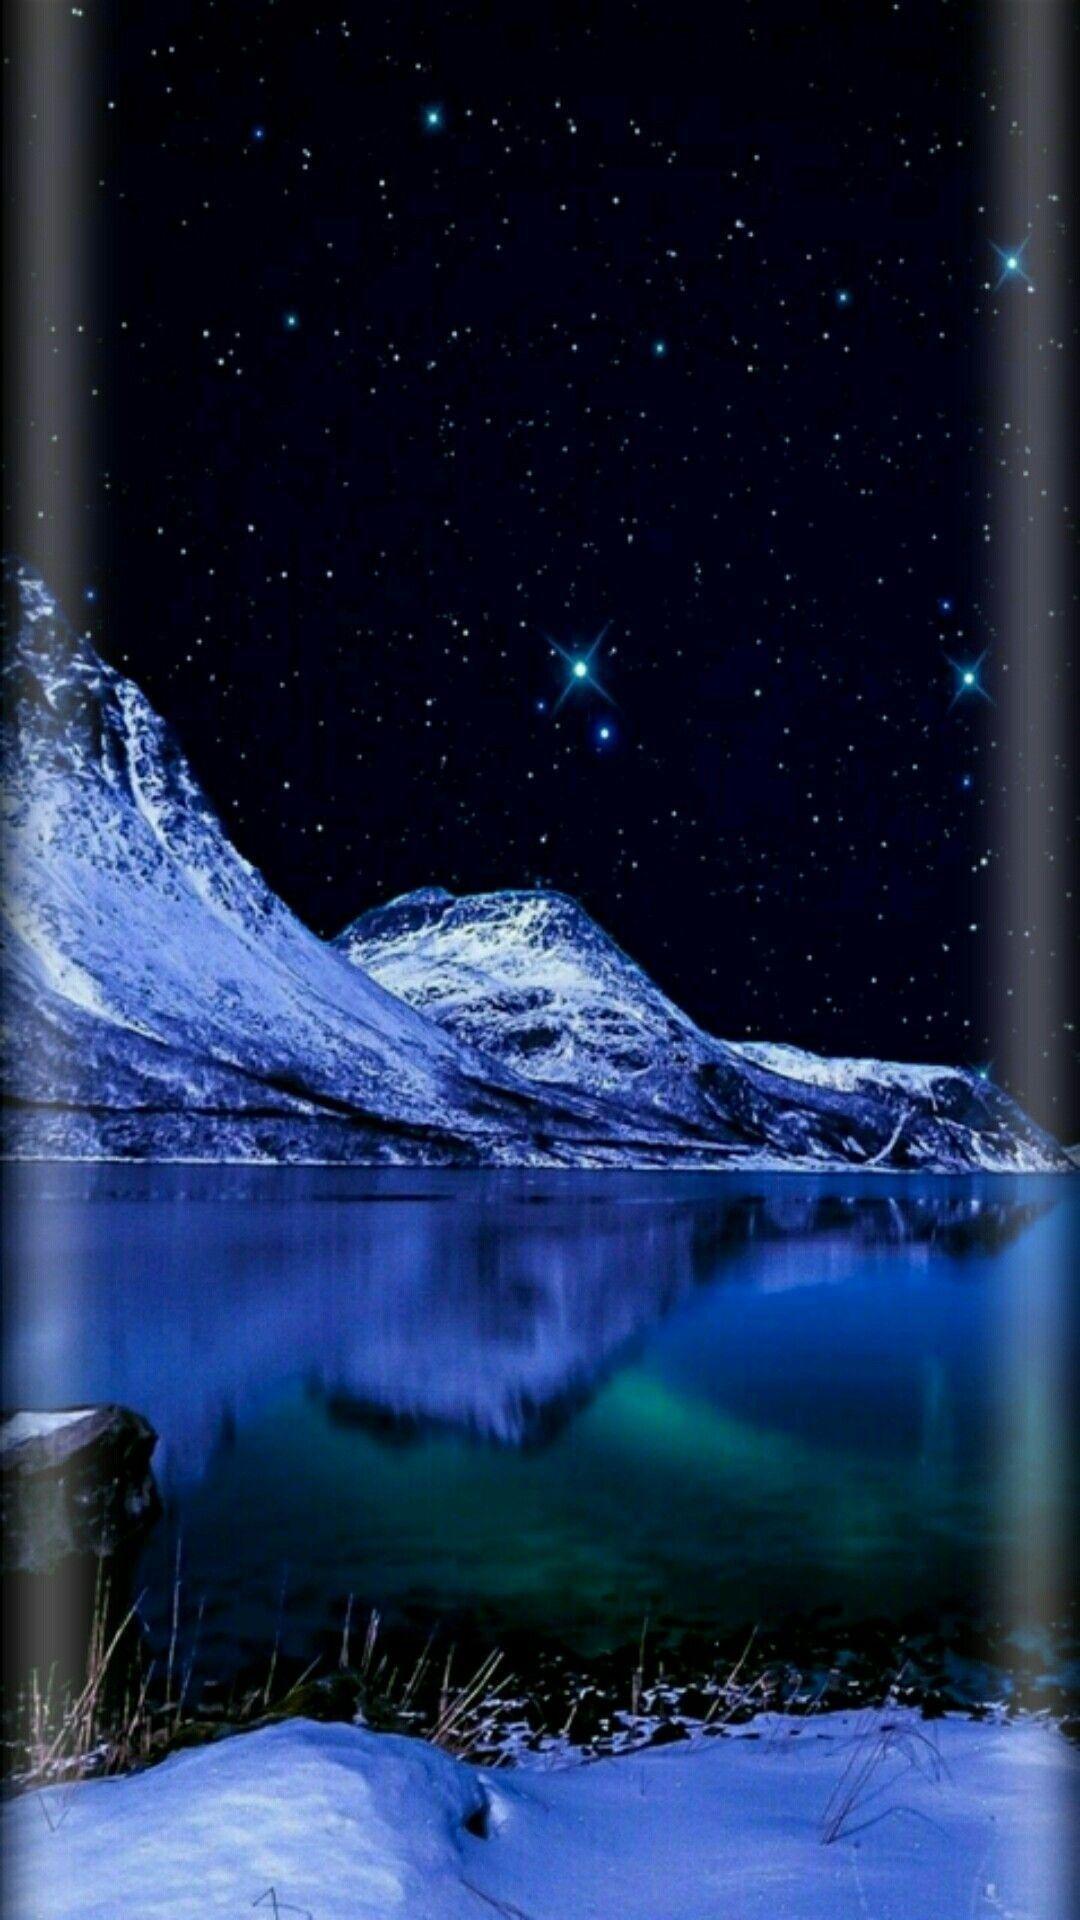 Night Sky Moon Stars Nature Nature In 2019 Hd Phone Wallpapers Night Scenery Night Sky Wallpaper Scenery Wallpaper